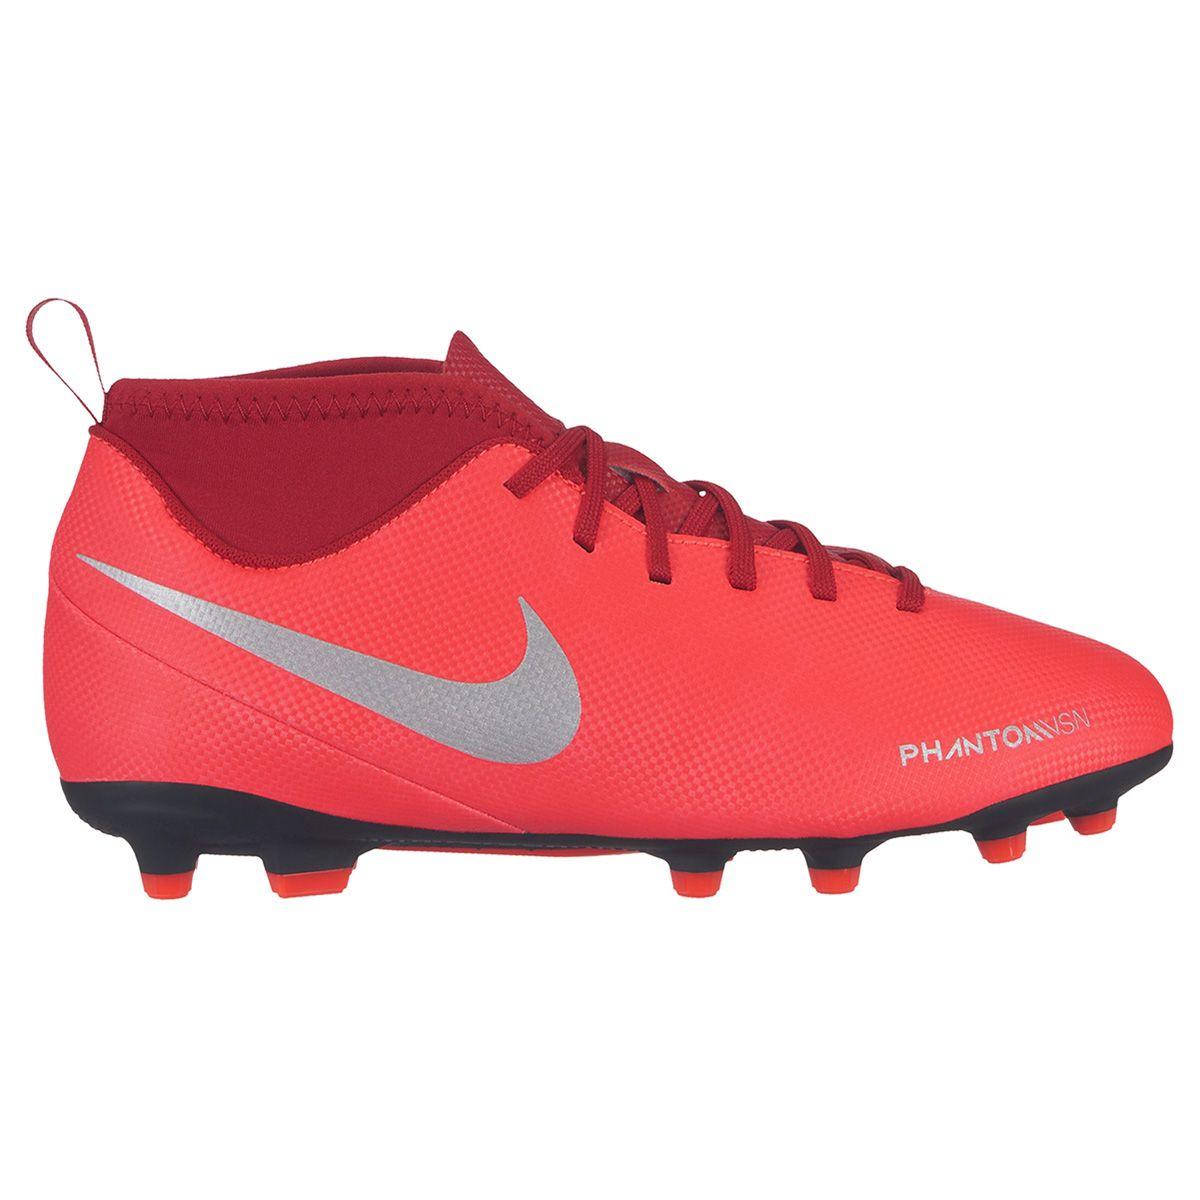 2ac2d6ddbb Chuteira Campo Infantil Nike Phantom VSN Club DF FG